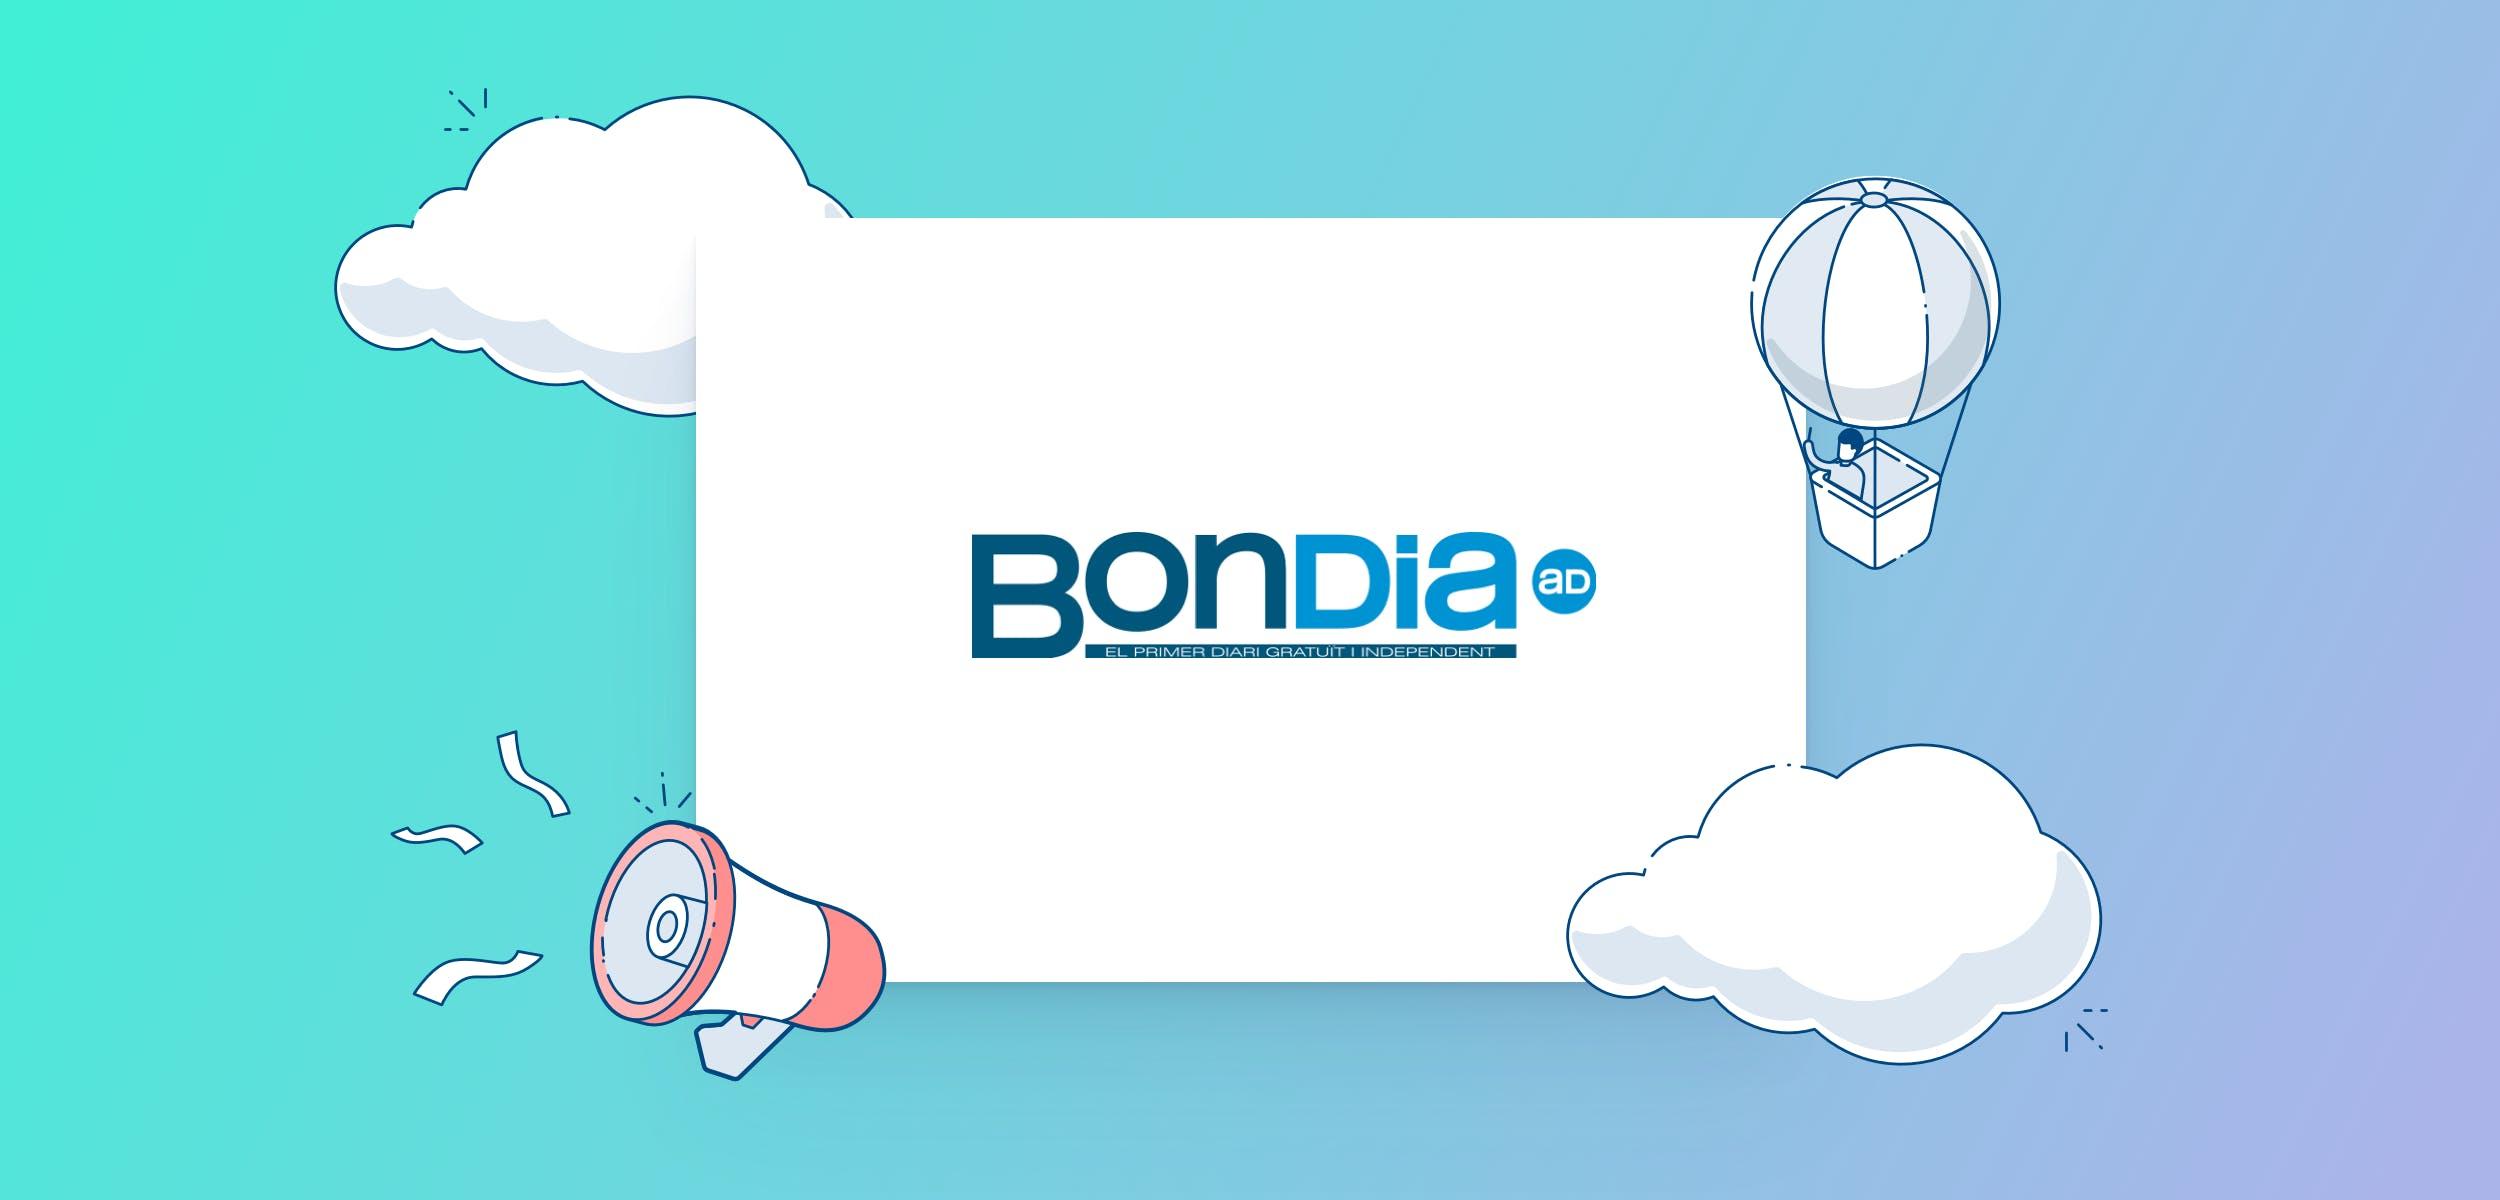 Bondia